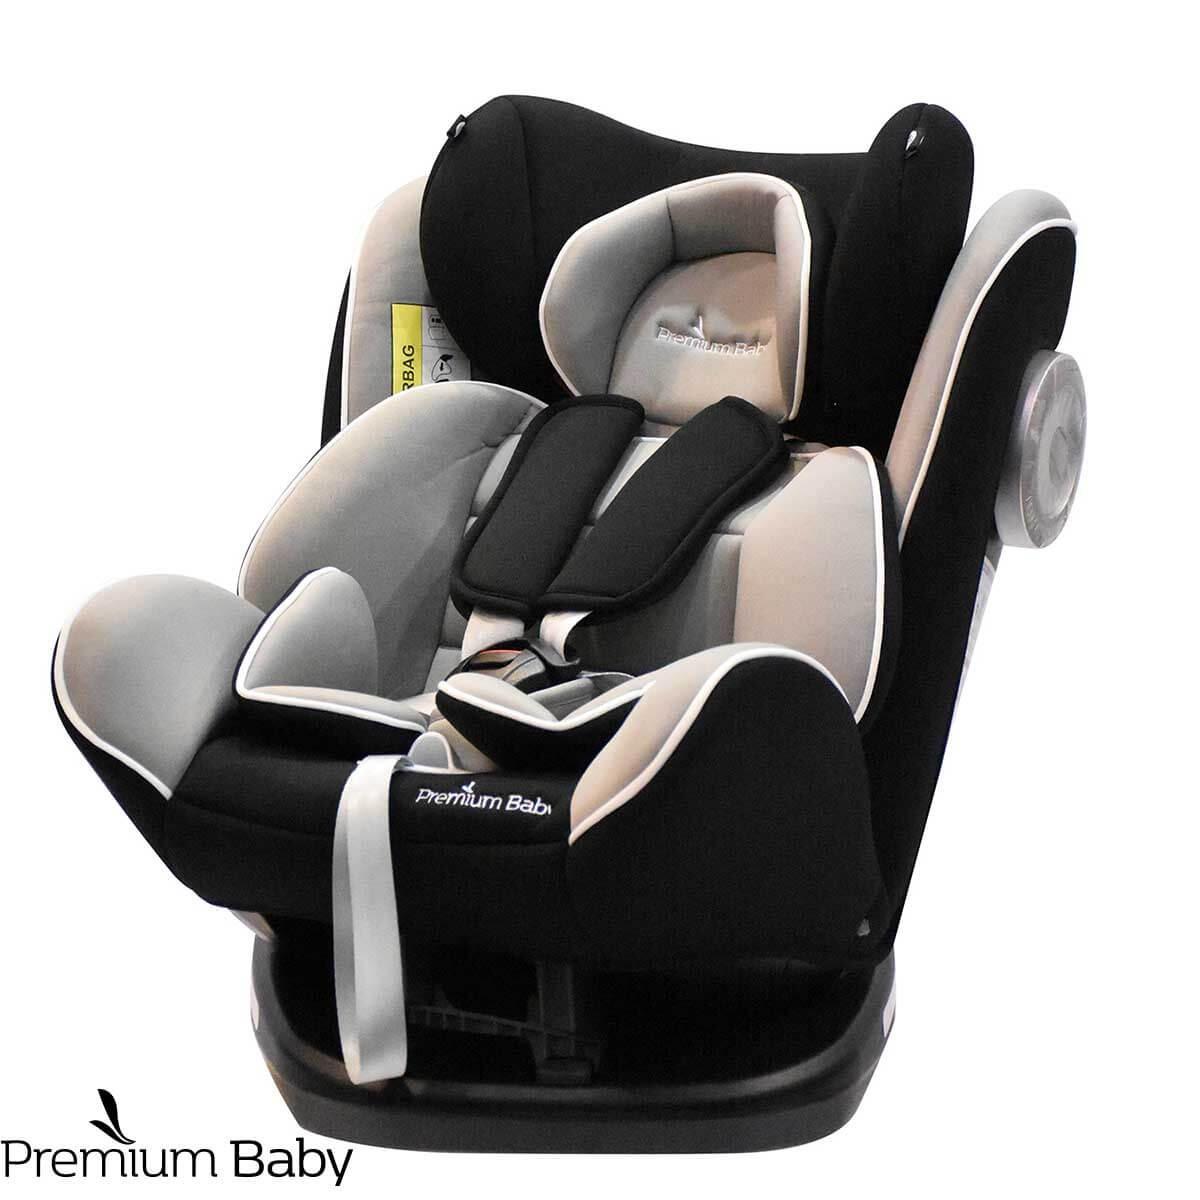 BUTACA PREMIUM BABY MURPHY 360º | 0 A 36 KG - ISOFIX